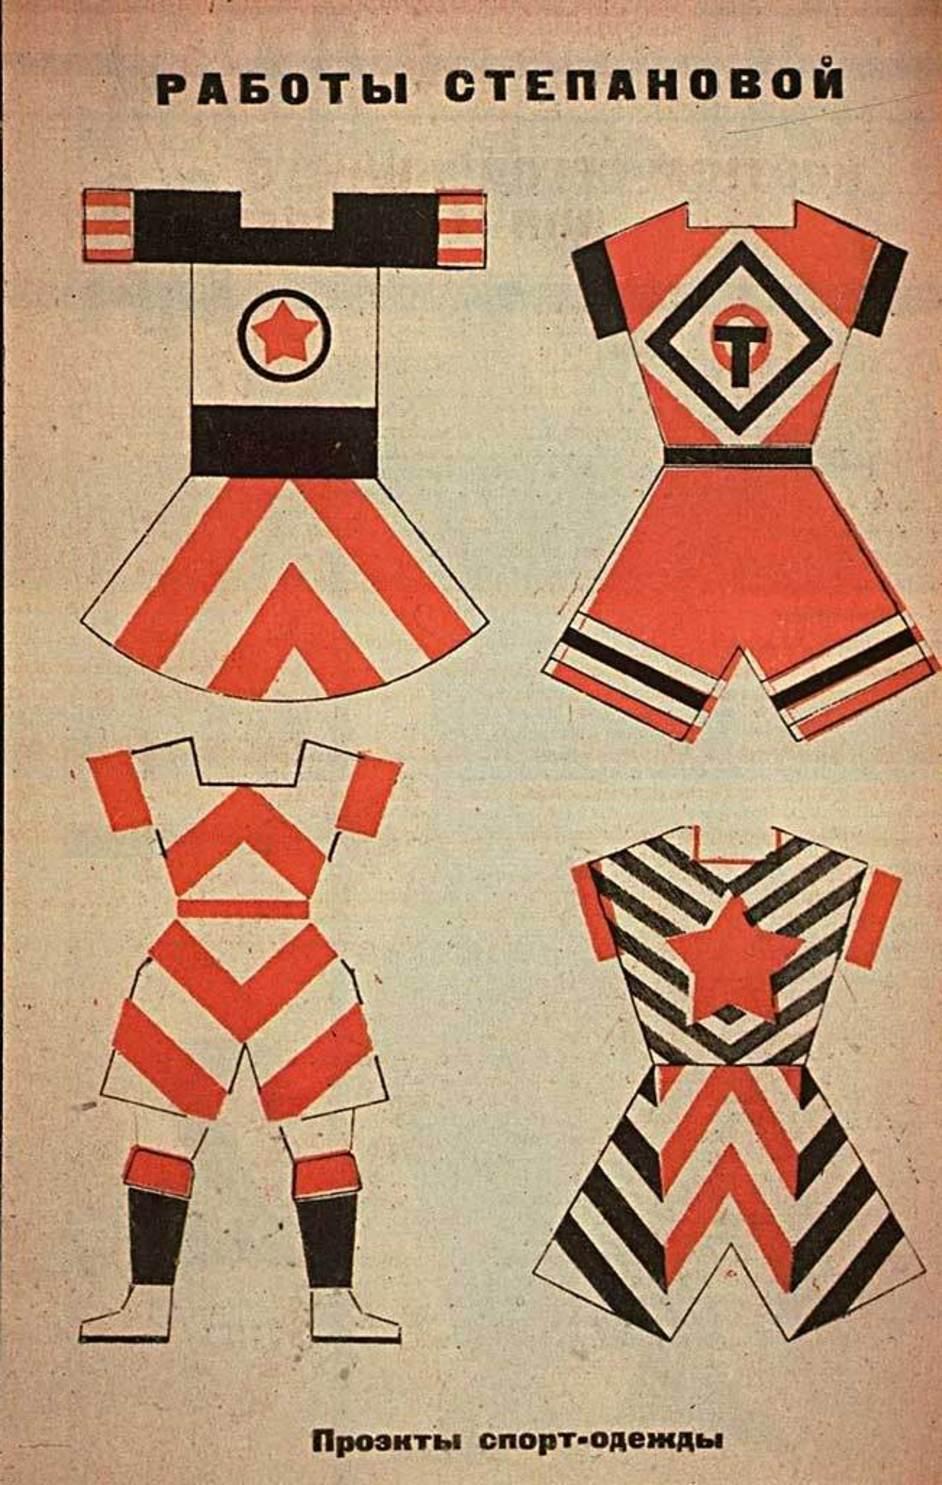 designs by Varvara Fyodorovna Stepanova